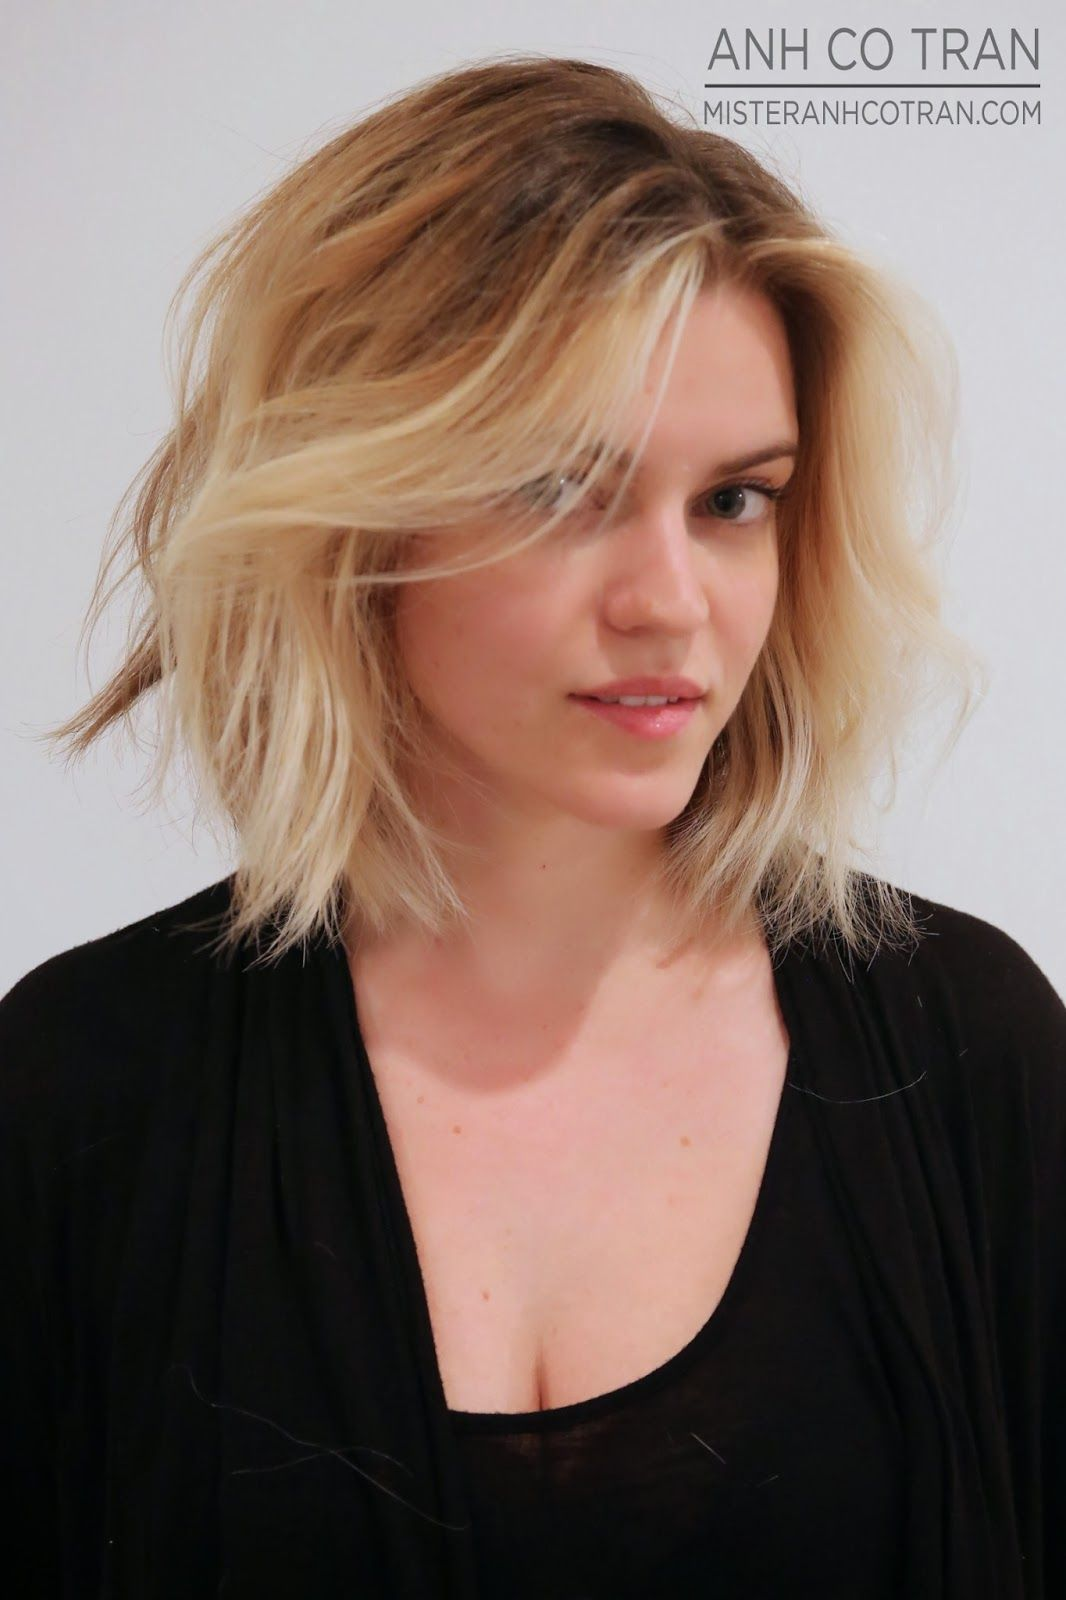 Anh co tran la a beautiful bob at ramireztran salon haircuts